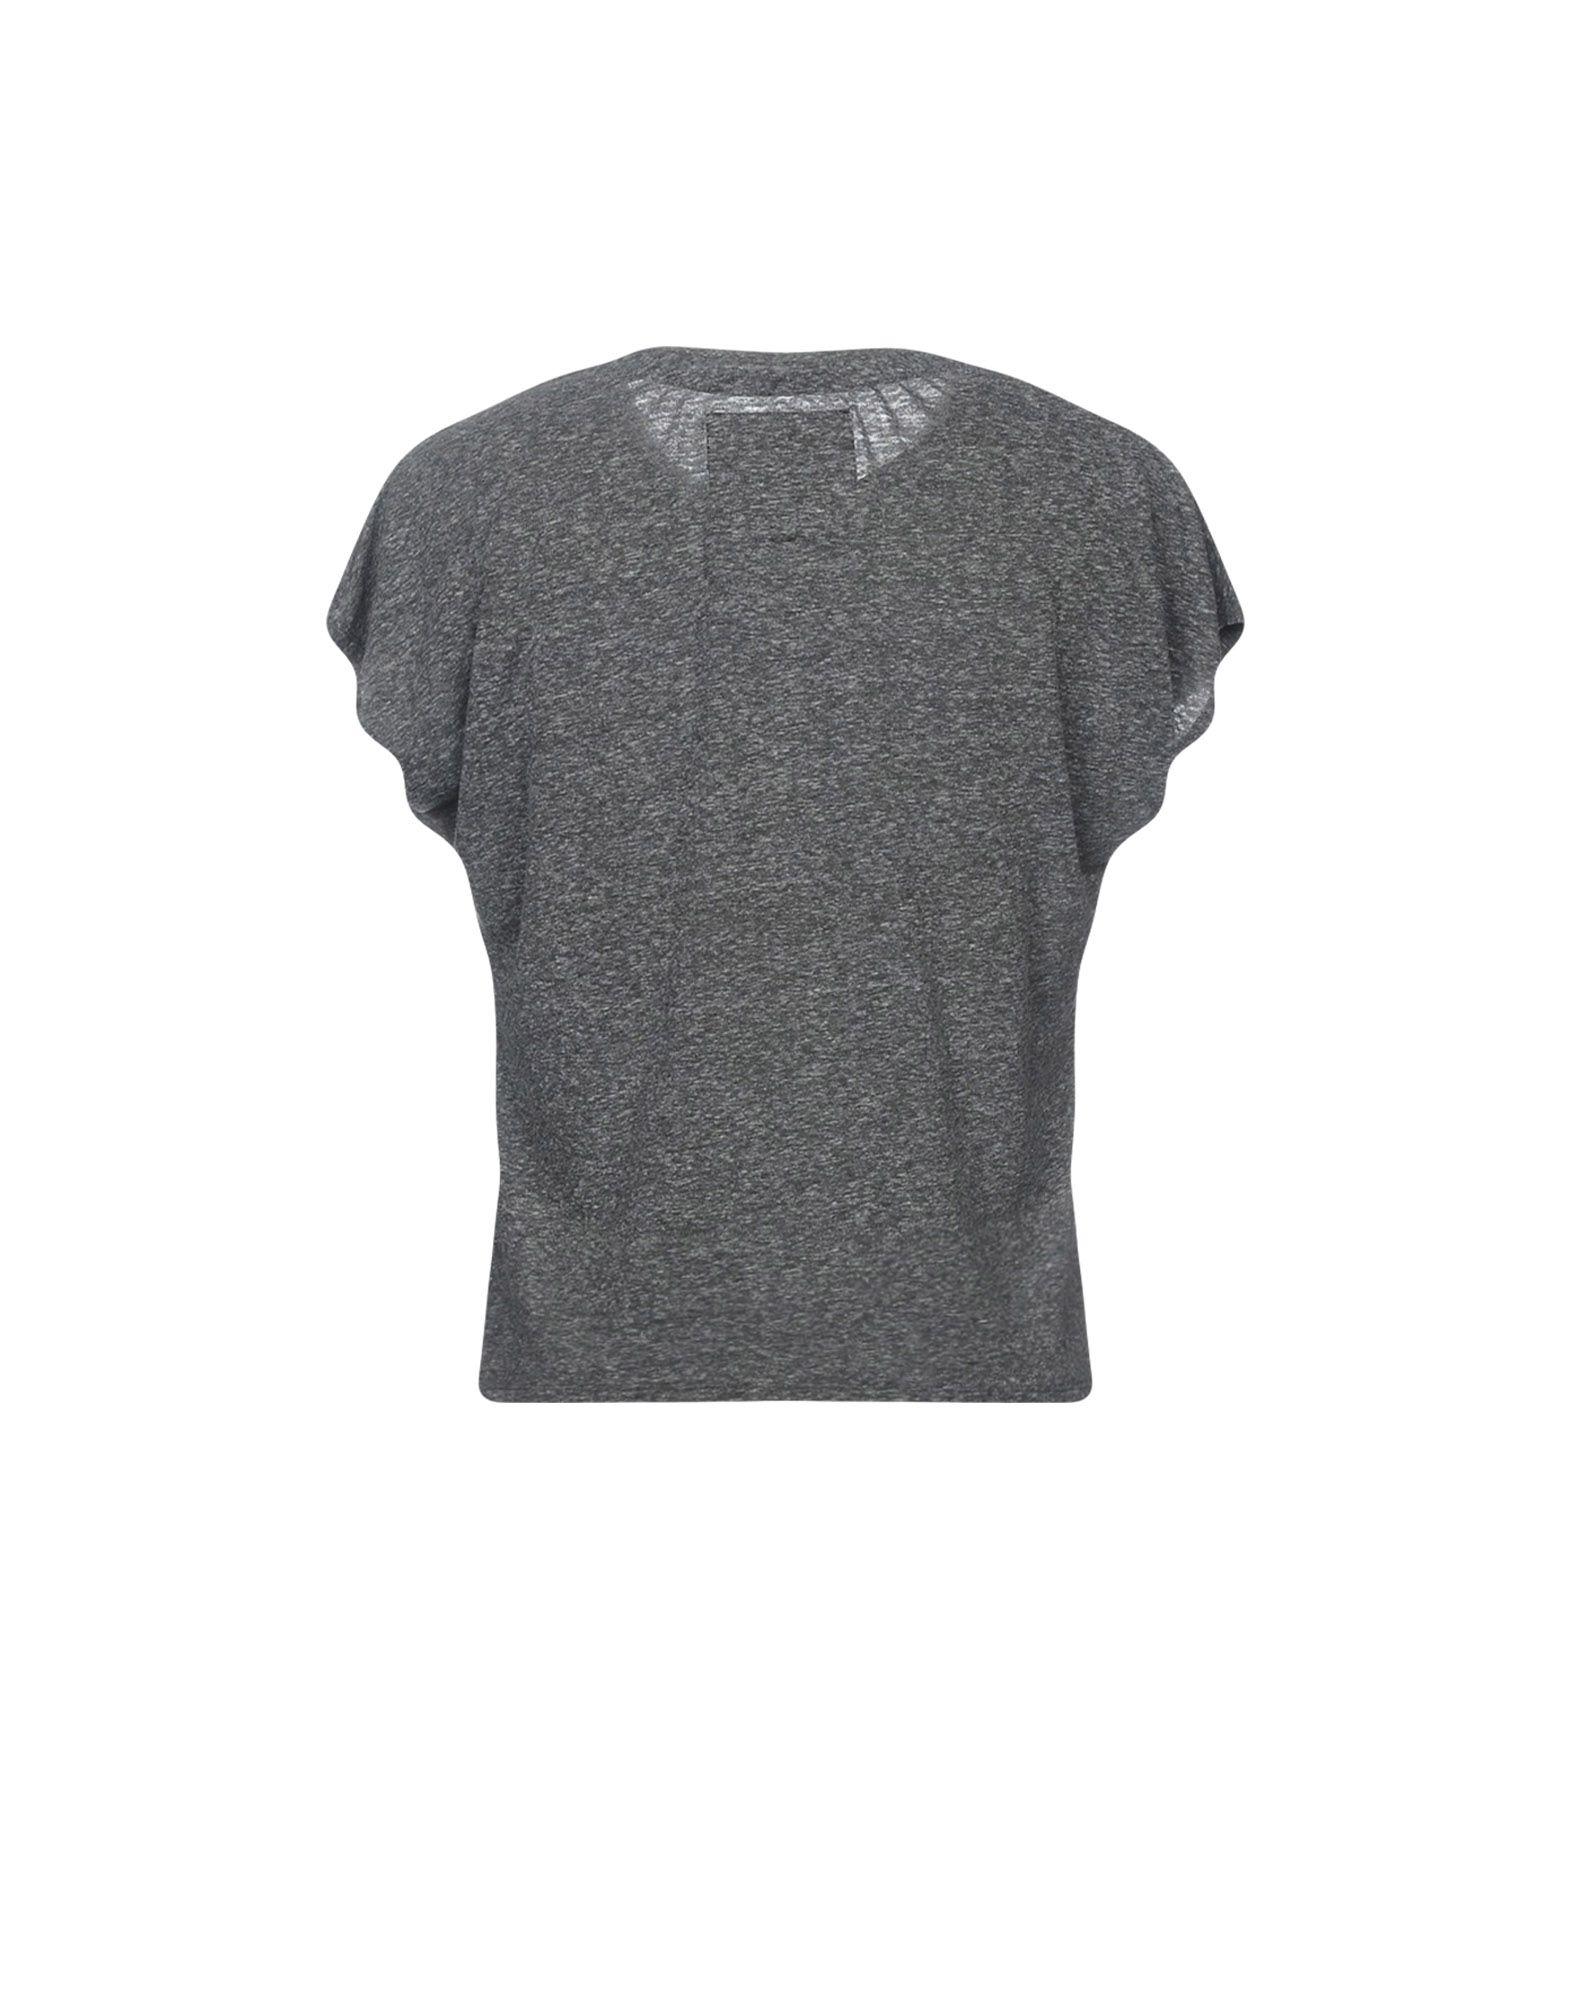 A buon mercato A buon mercato Uomo T-Shirt Superdry Uomo mercato - 12161551EF d0f968